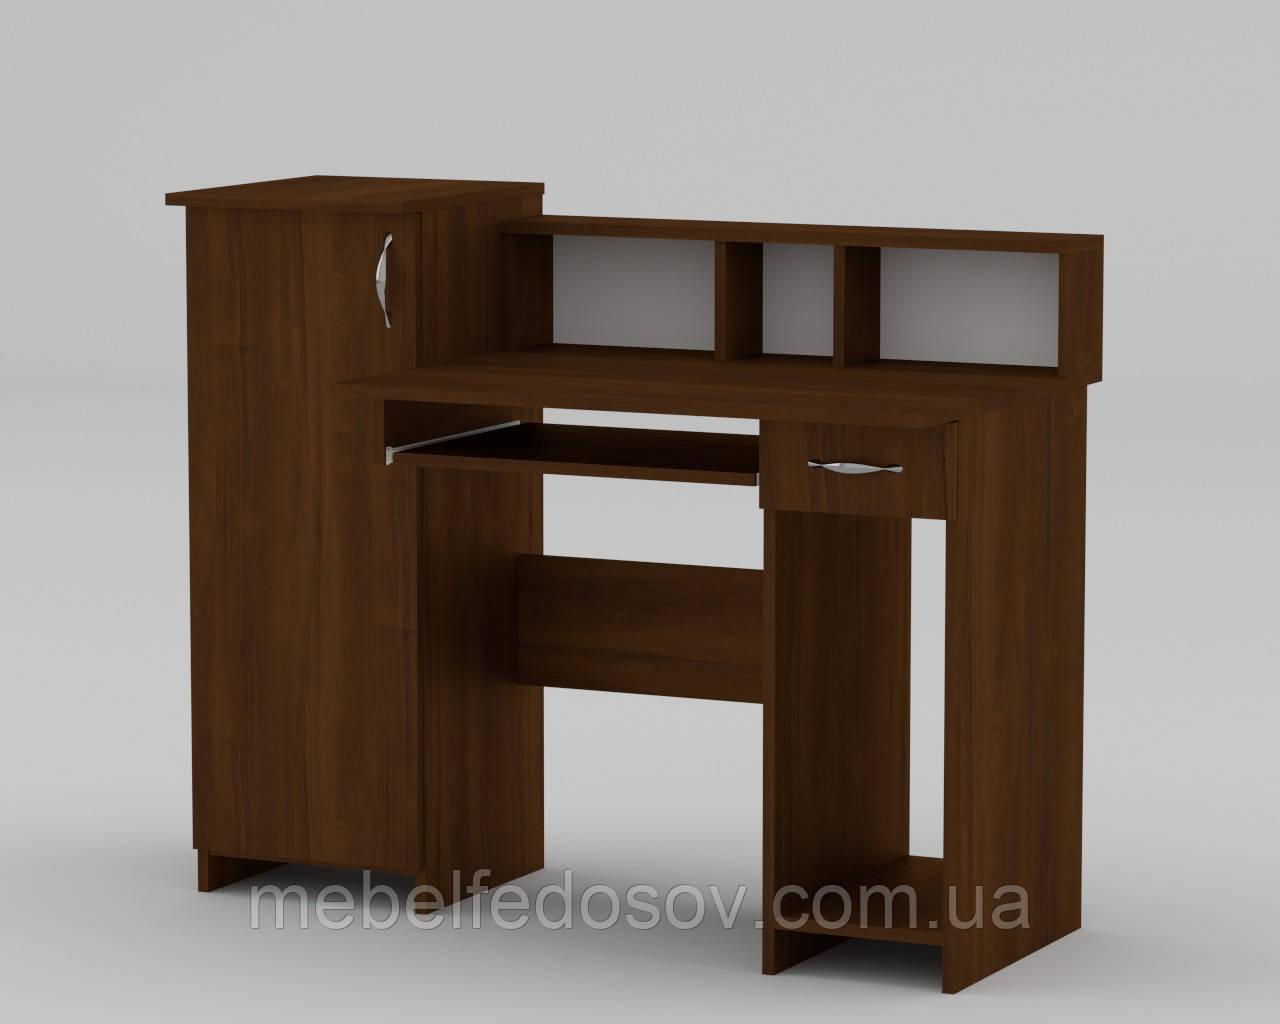 Стол компьютерный ПИ-ПИ-2 (Компанит) 1175х600х736+220мм